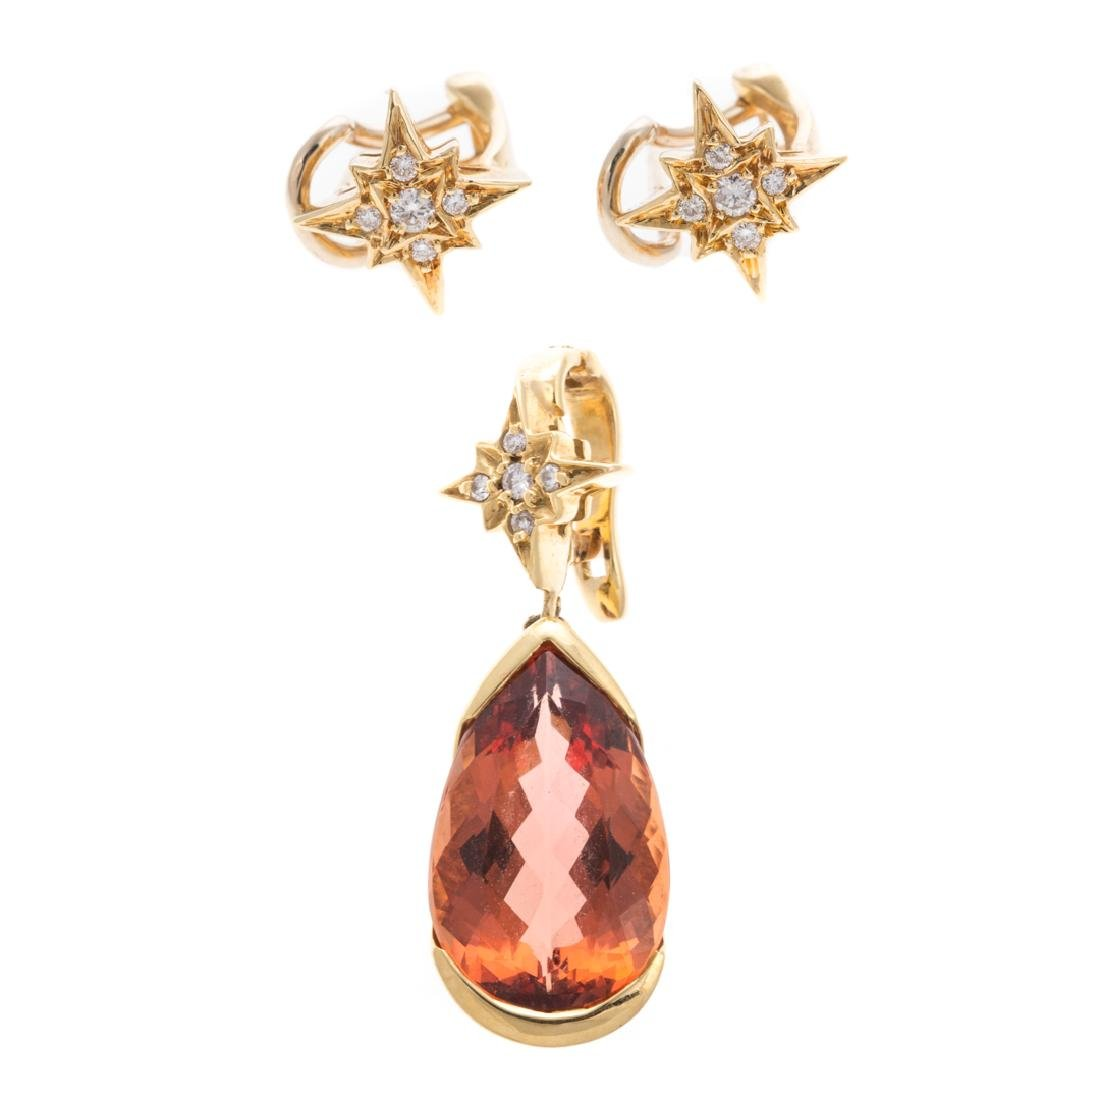 An Imperial Topaz Pendant & Earrings by H. Stern